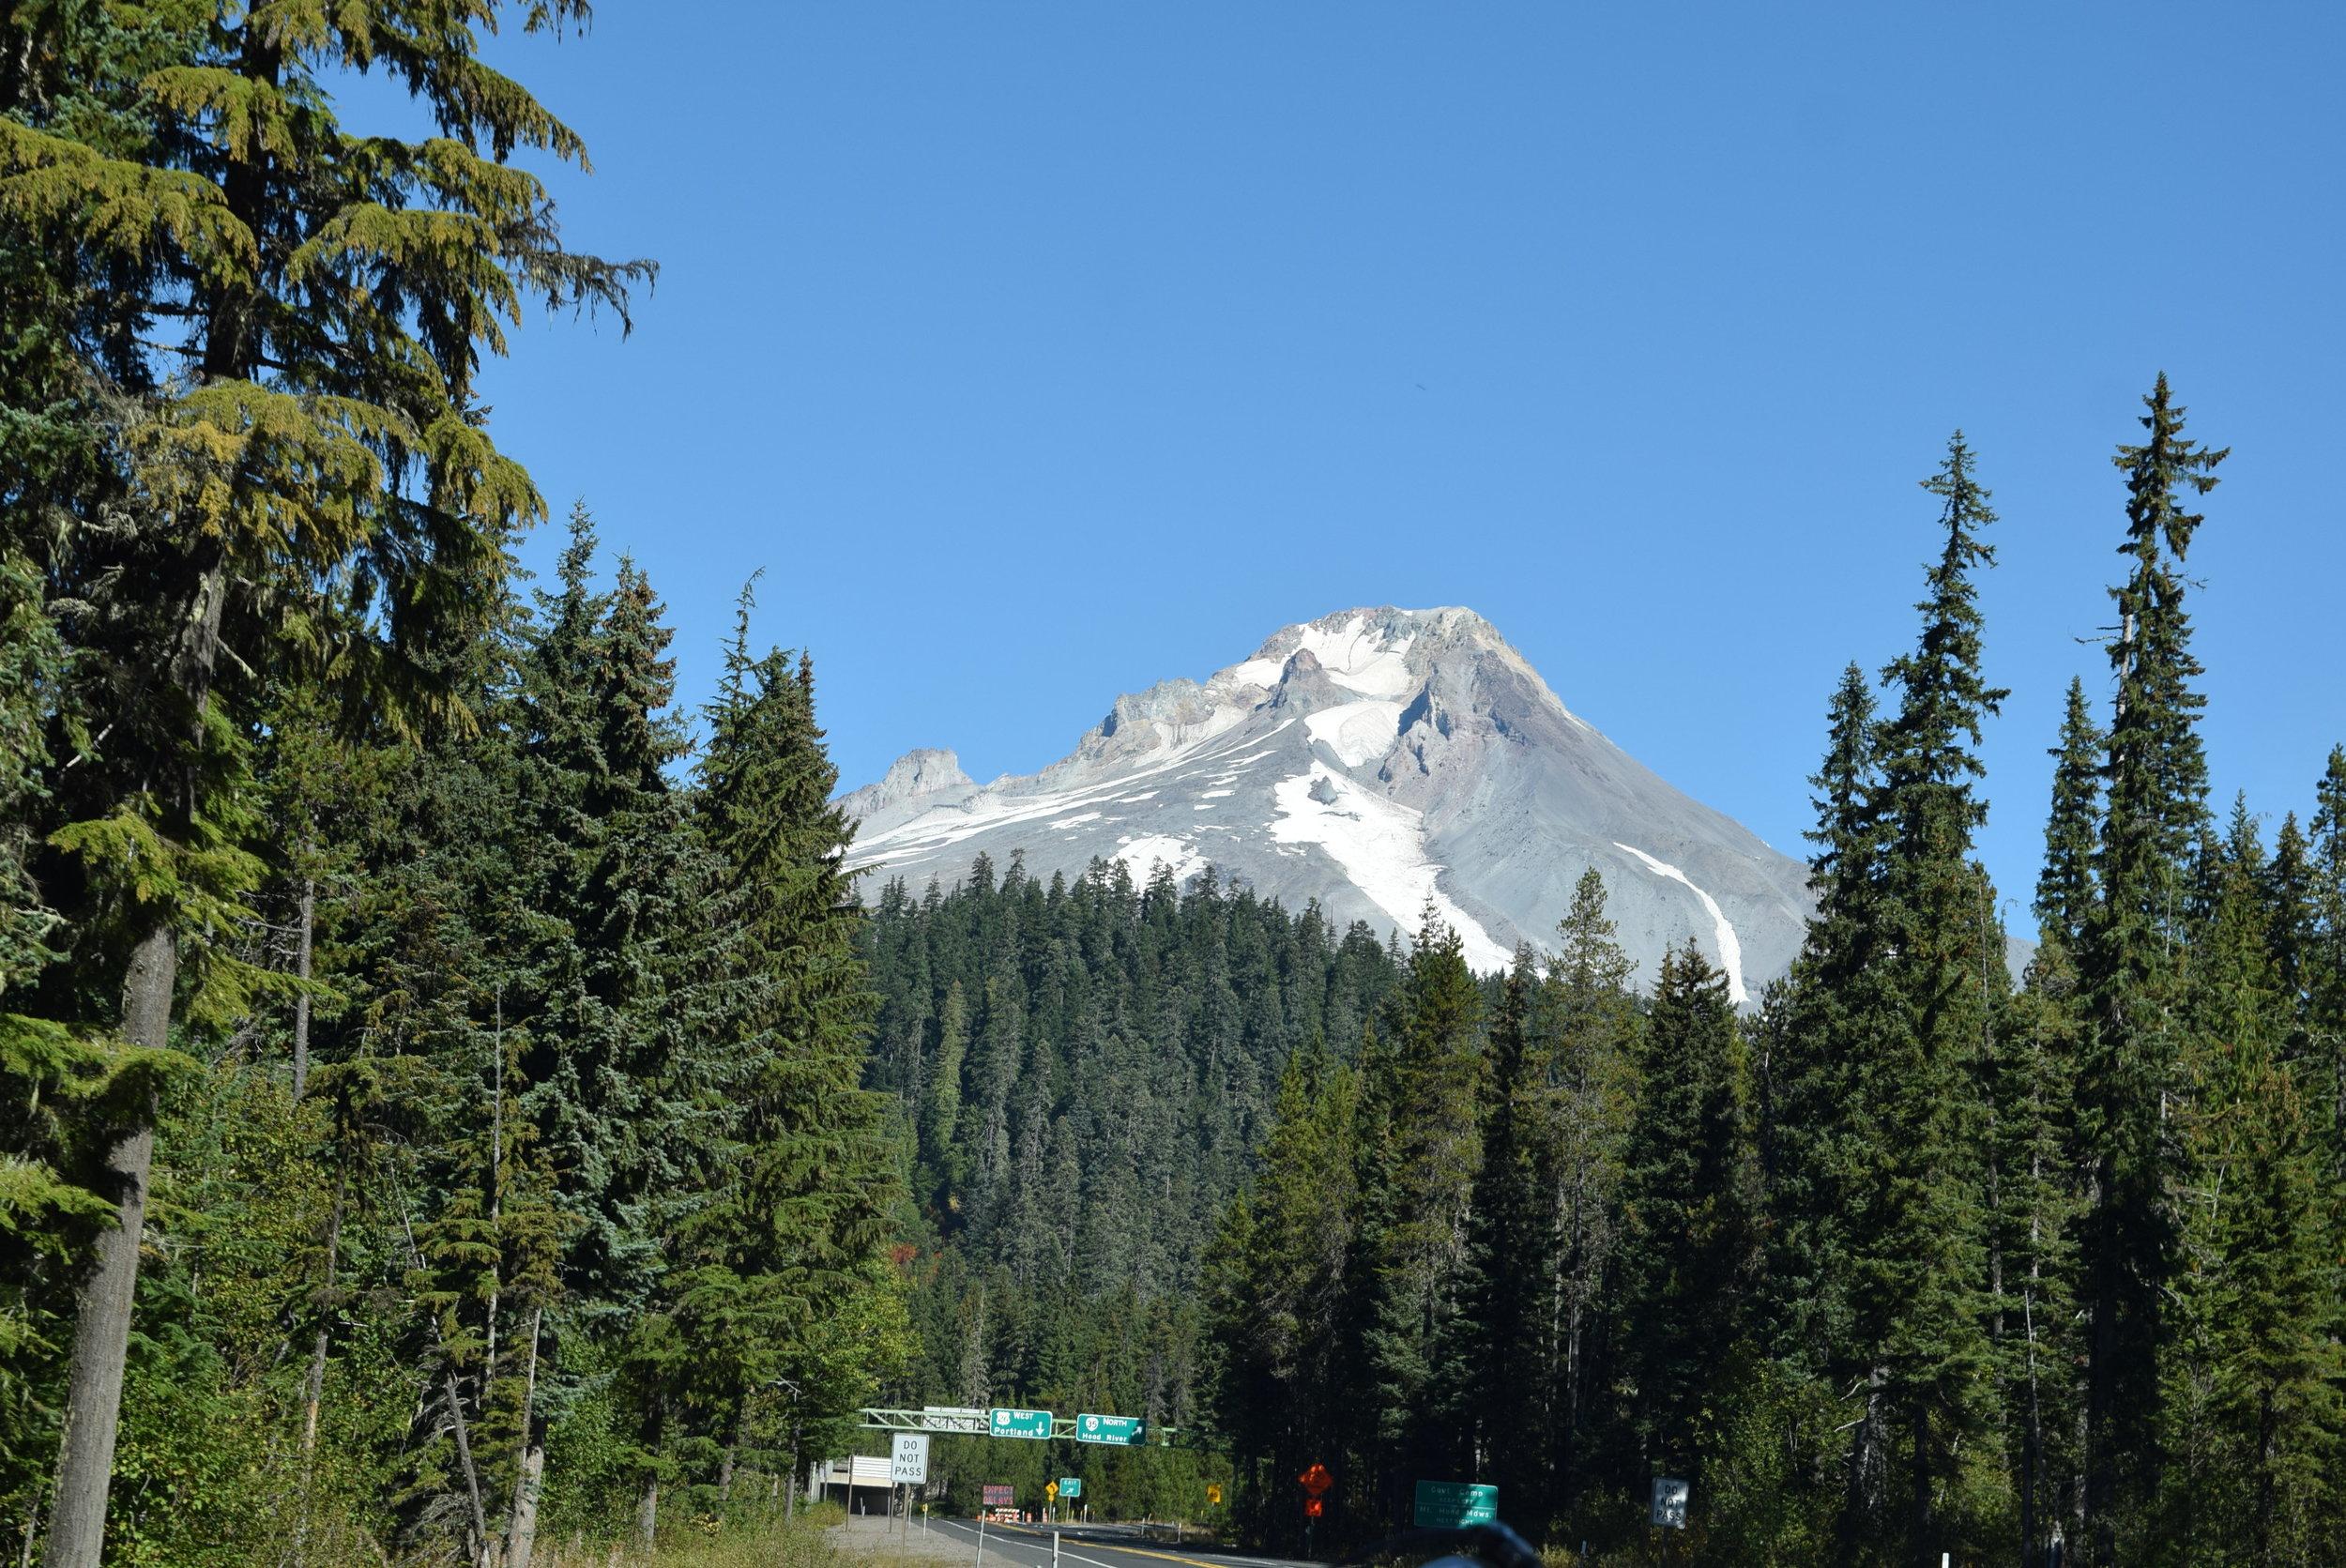 A peek of Mt. Hood on our way to Portland.